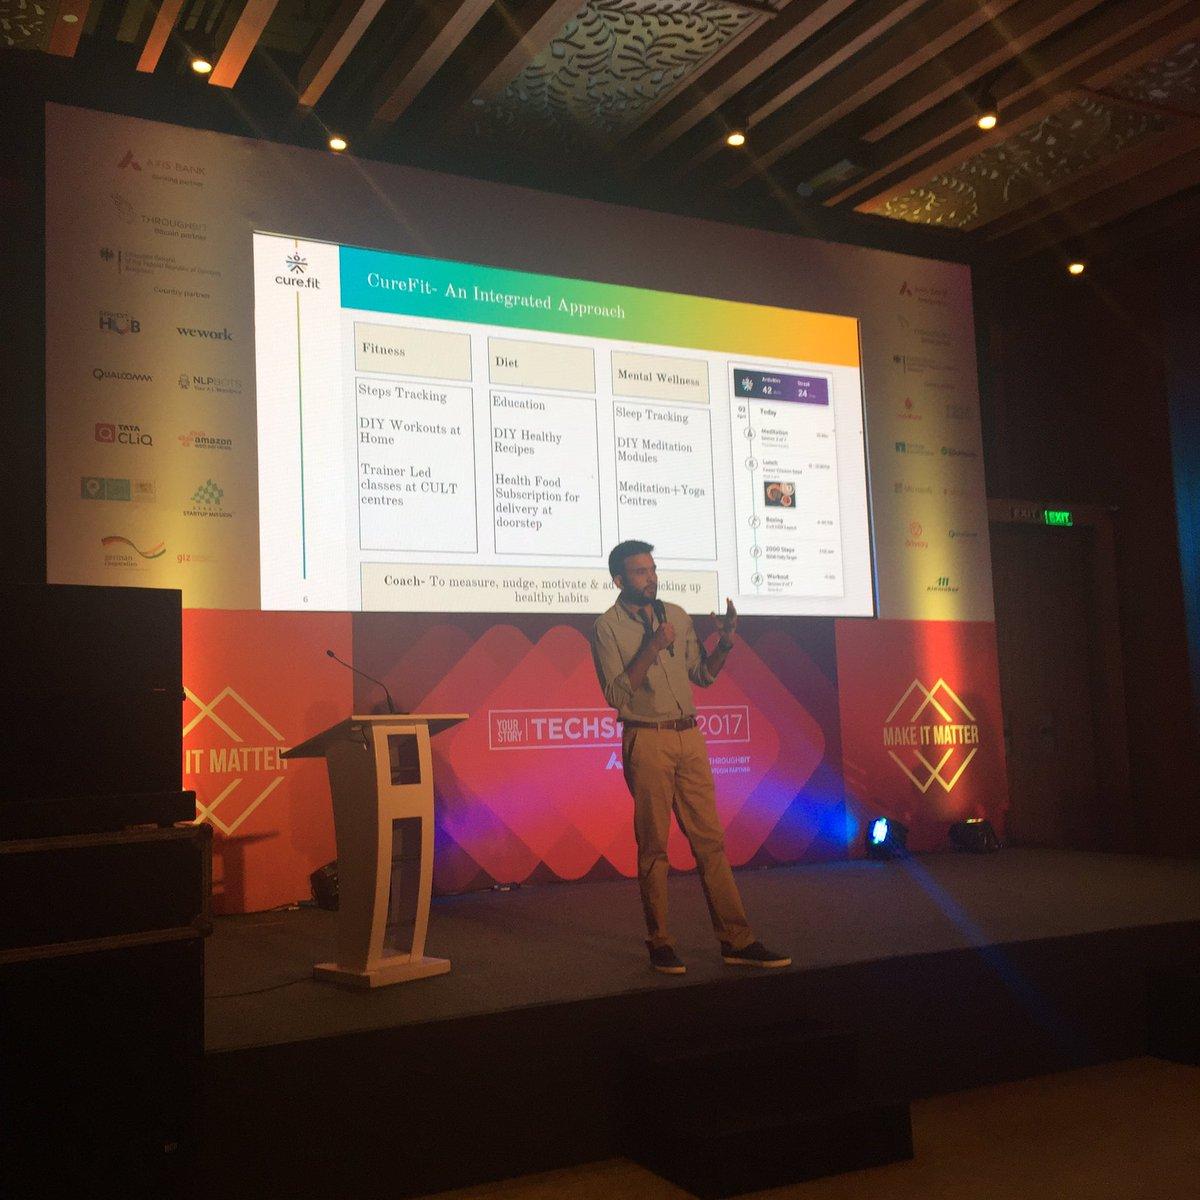 Indian #ehealth startup @BeCureFit is combining #fitness, #diet &amp; #mentalhealth. Both offline and online. @FTR4H #impressive #TSparks<br>http://pic.twitter.com/lusKGibAMD